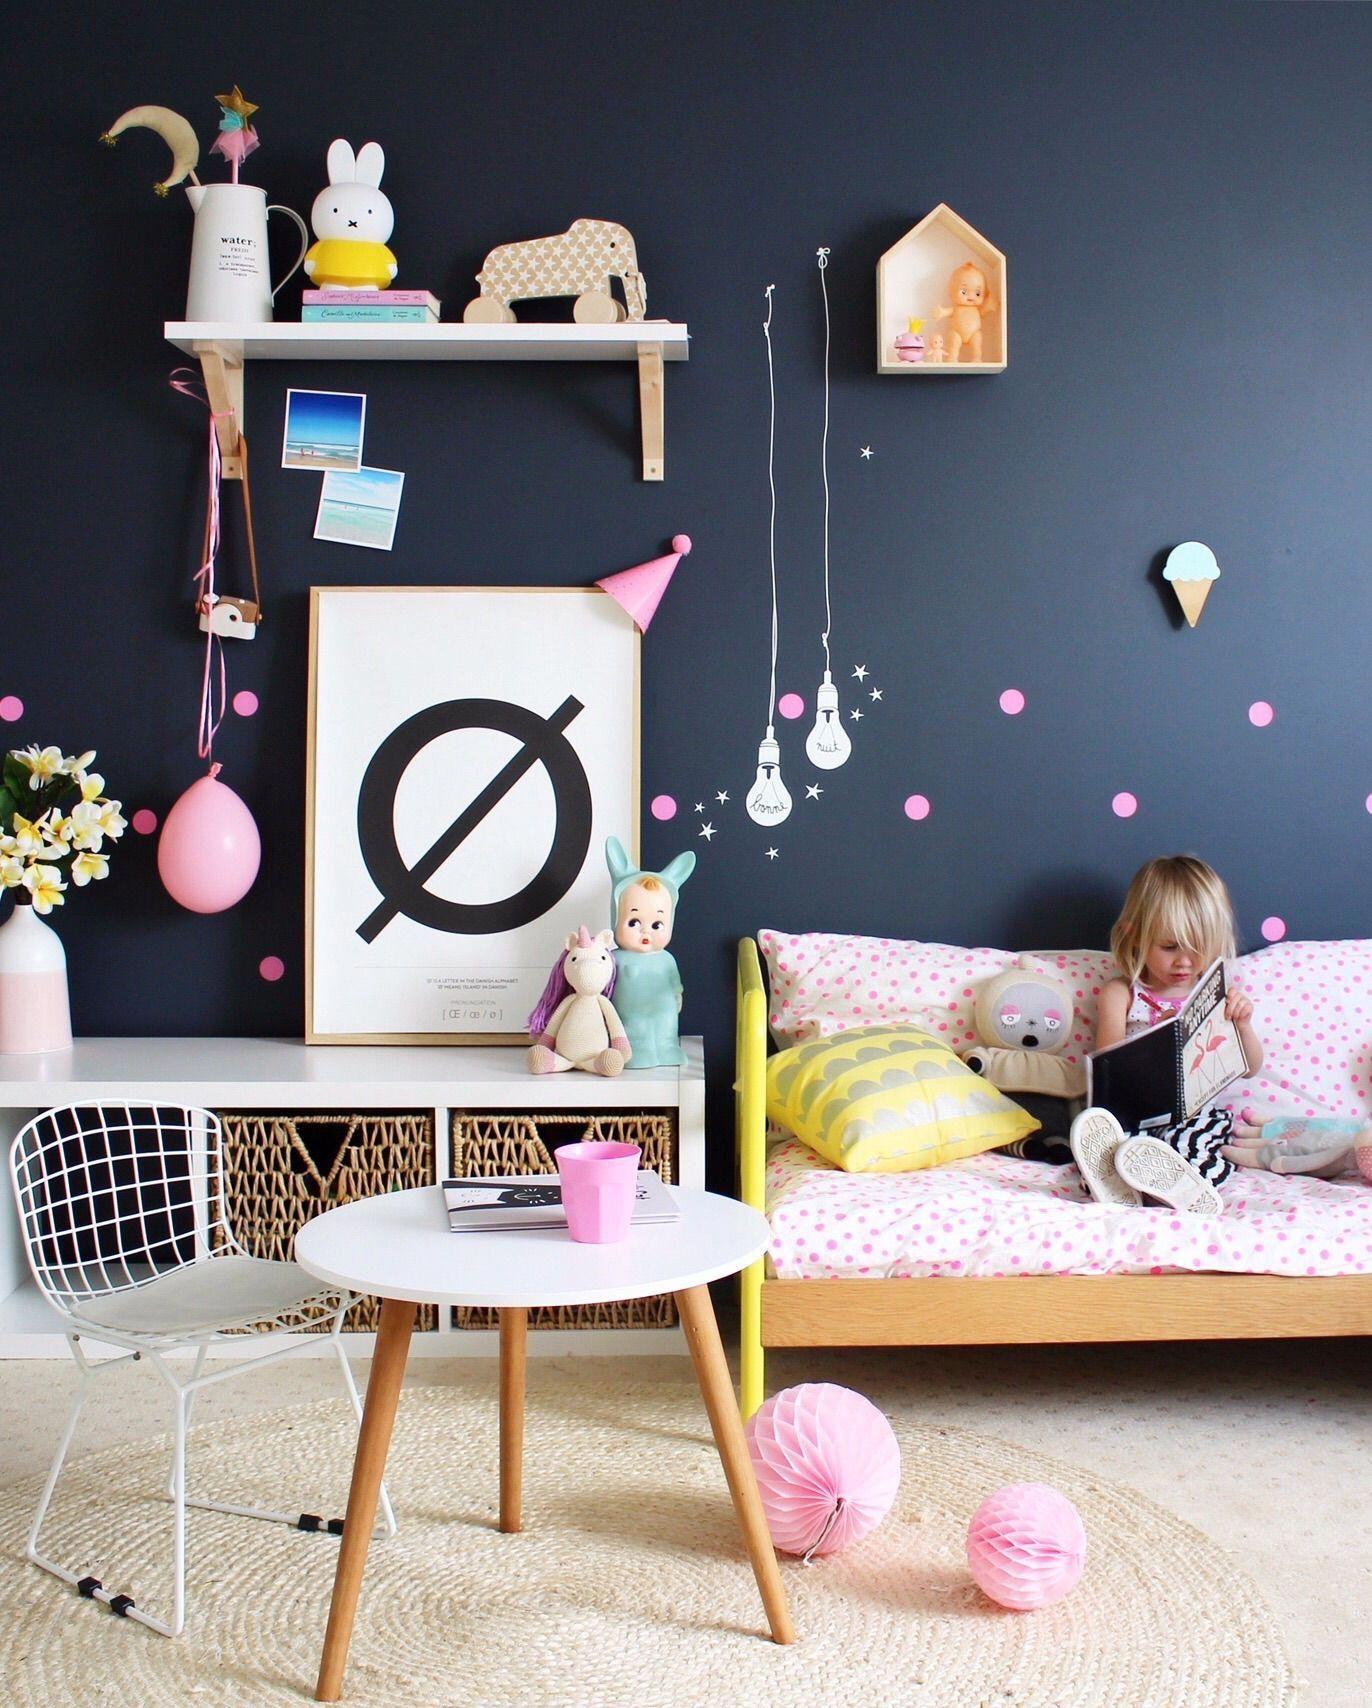 Kids  bedroom ideas celebrating the th anniversary of french designer mimi lou kidbedroomideasforgirls also rh pinterest